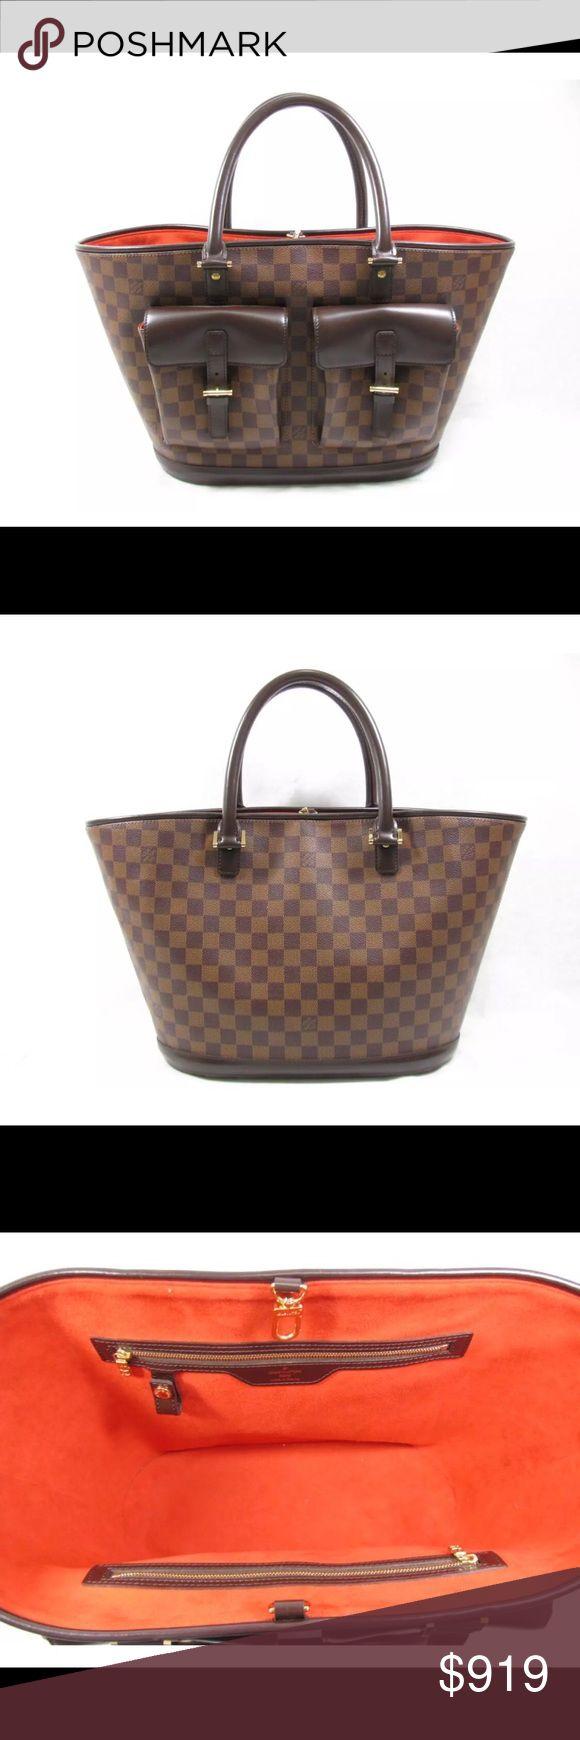 Auténtico LOUIS VUITTON Manosque GM de mano Damier Like new never used in perfect conditions Louis Vuitton Bags